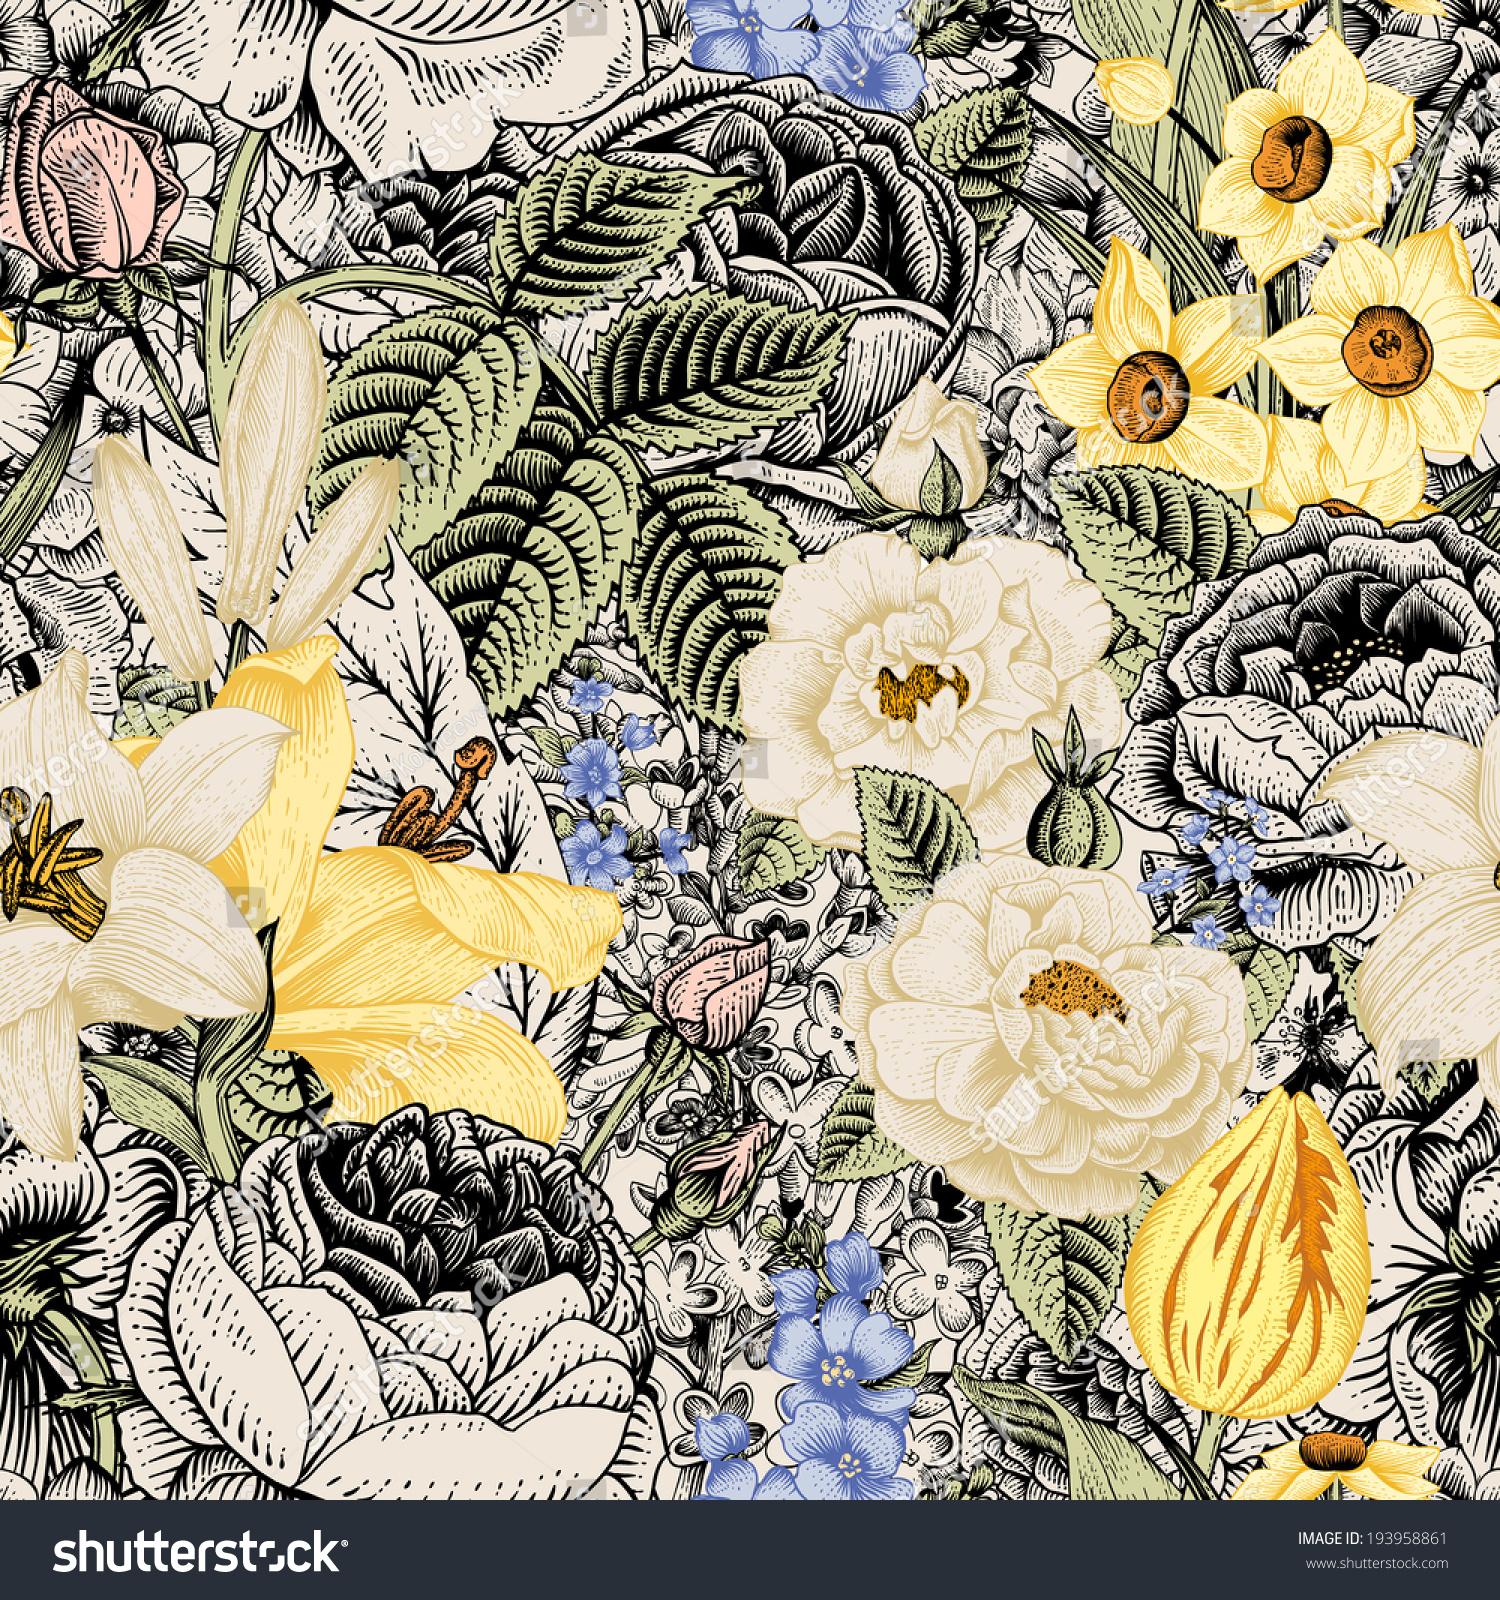 Summer Seamless Floral Pattern Vintage Flowers Stock Image